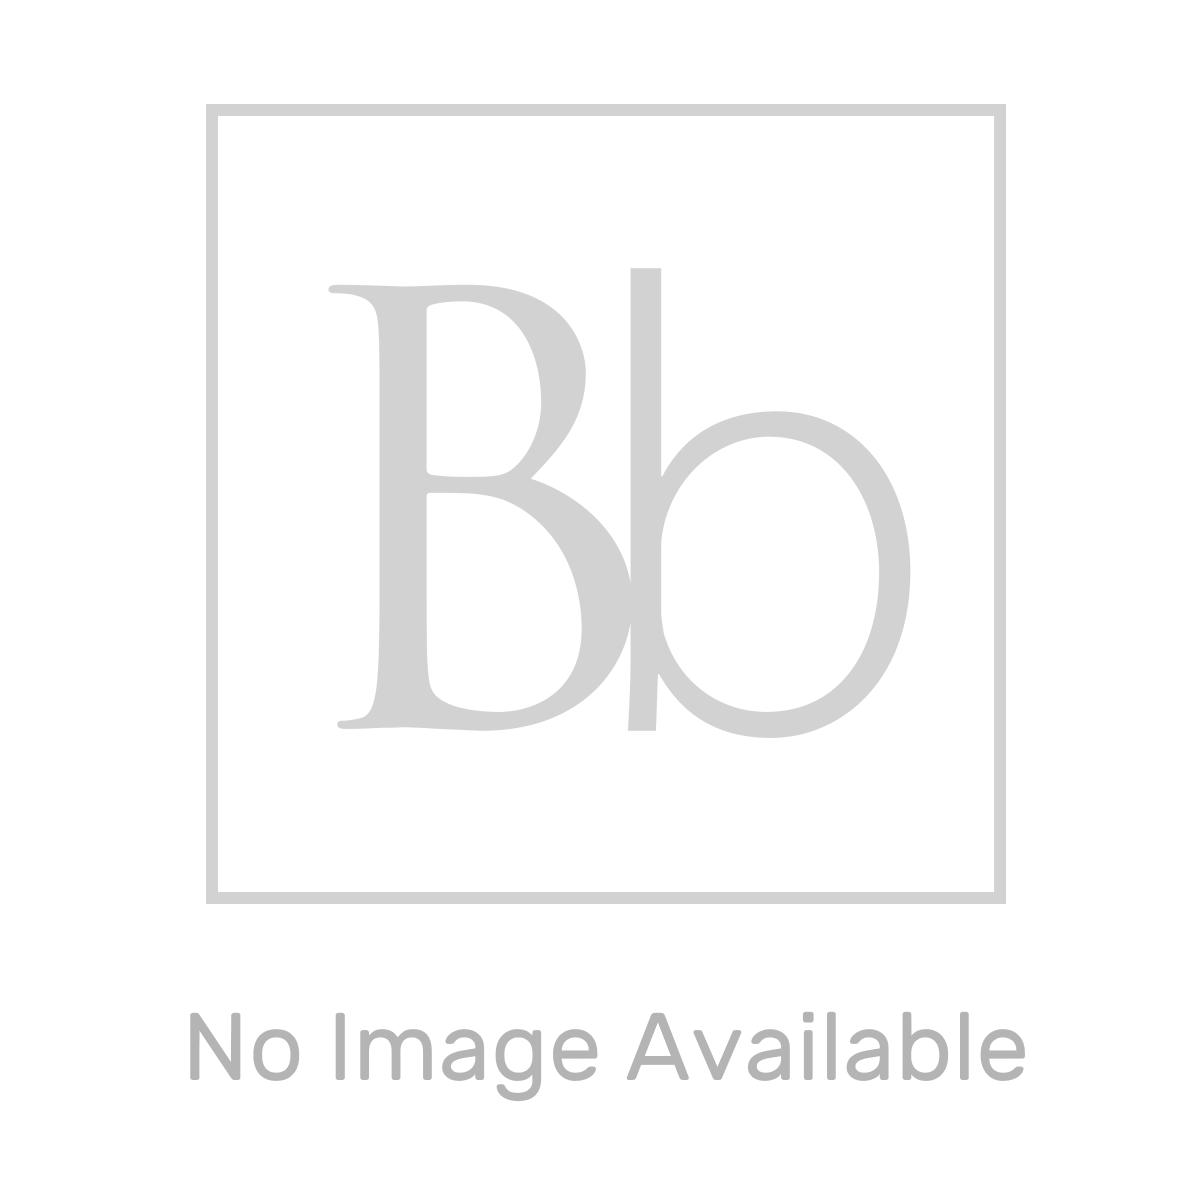 Nuie Athena Grey Avola 2 Drawer Floor Standing Vanity Unit with 18mm Worktop 600mm